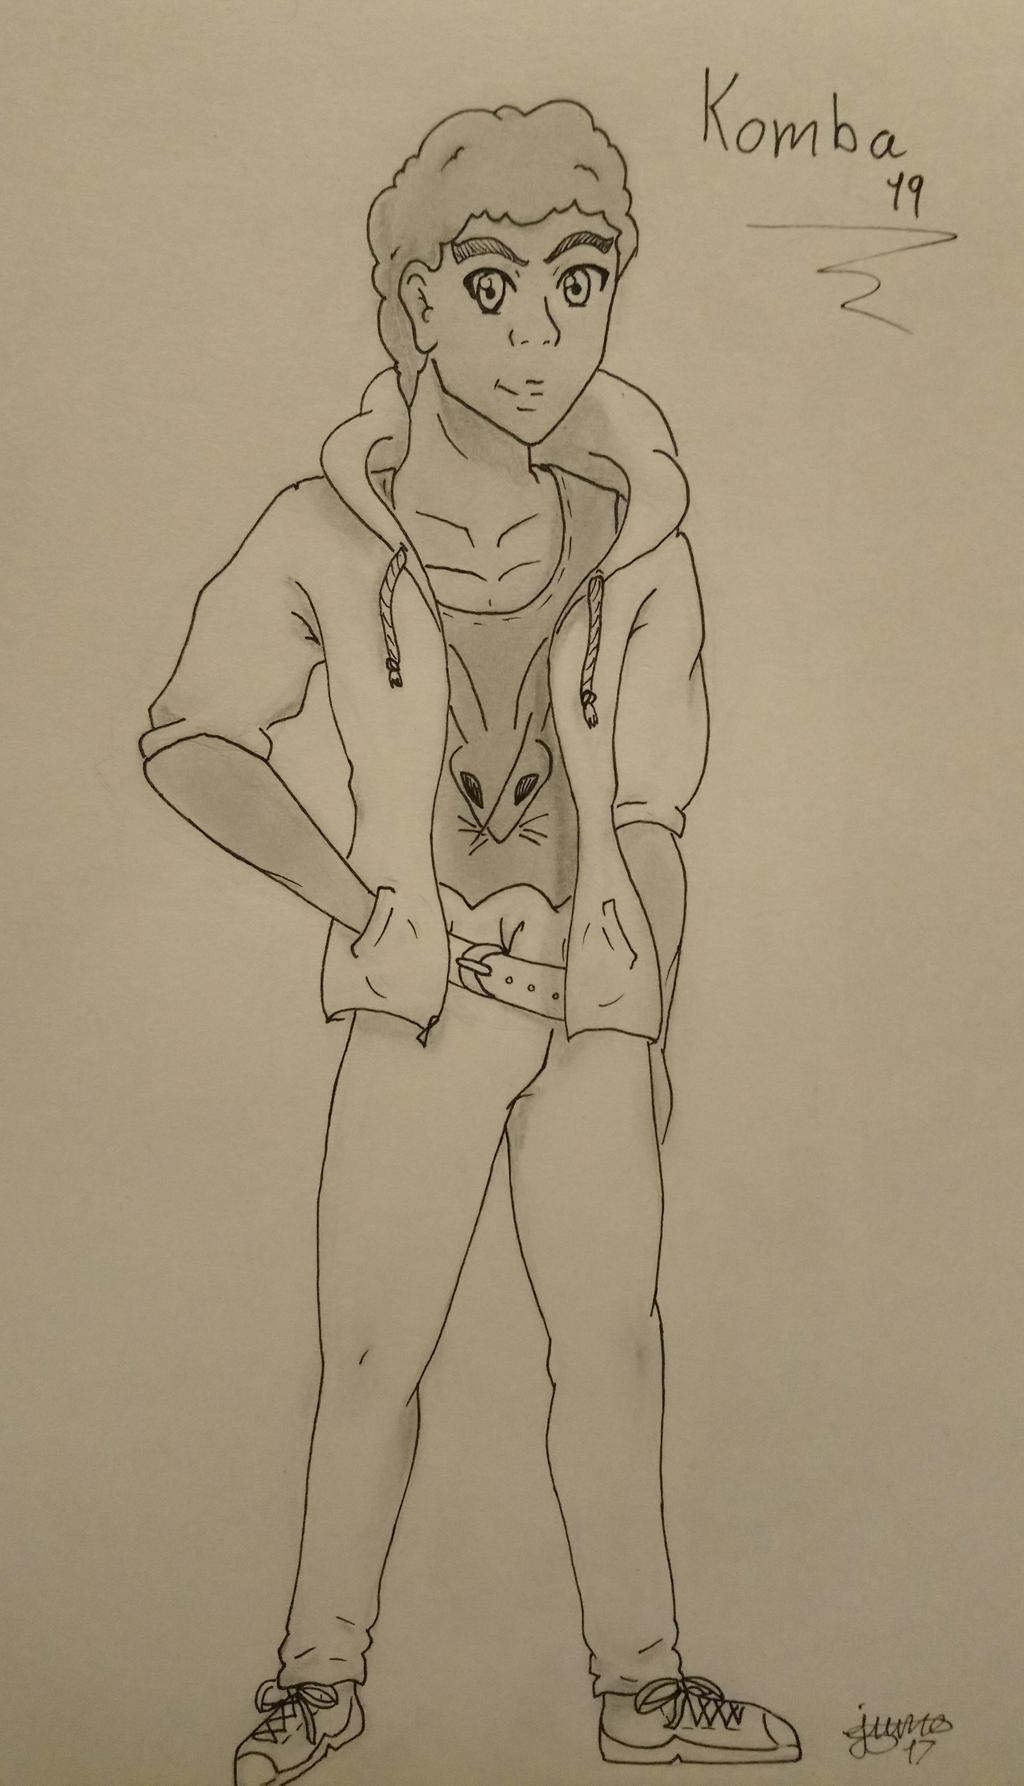 Bakugan: grown up Komba by Elmer157Typhlosion